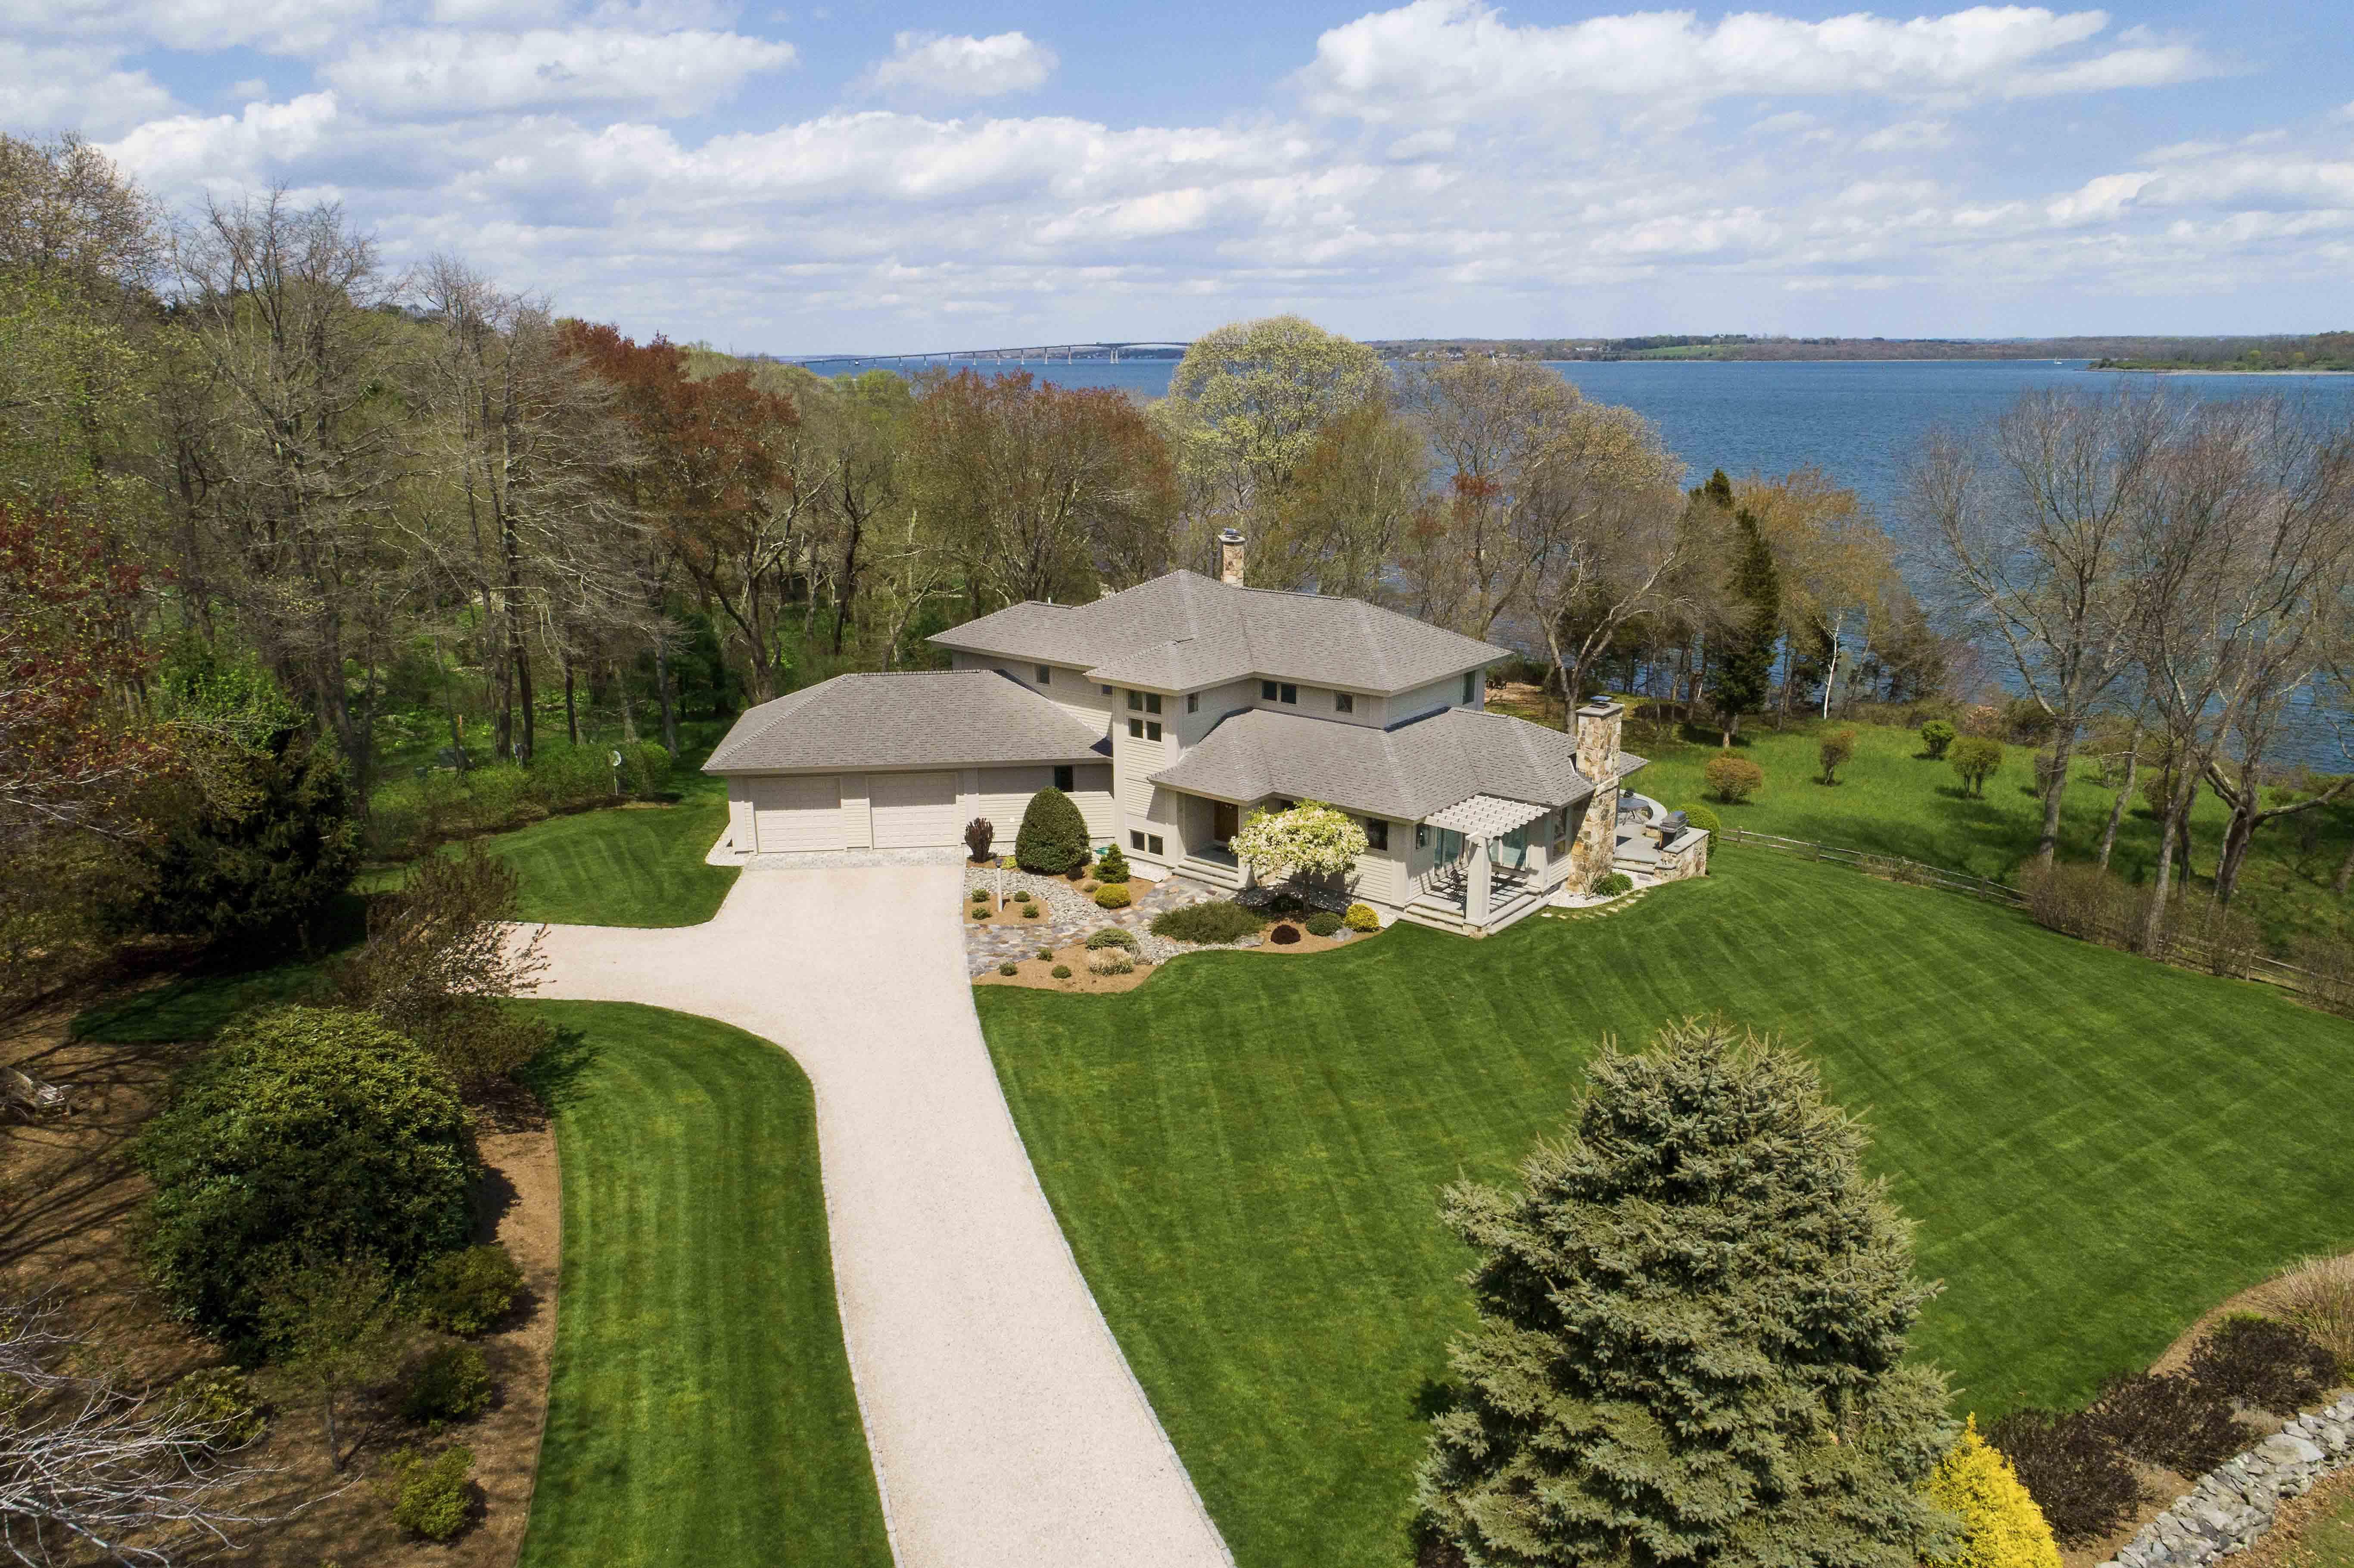 Narragansett Waterfront Home Sells For $2.5 Million